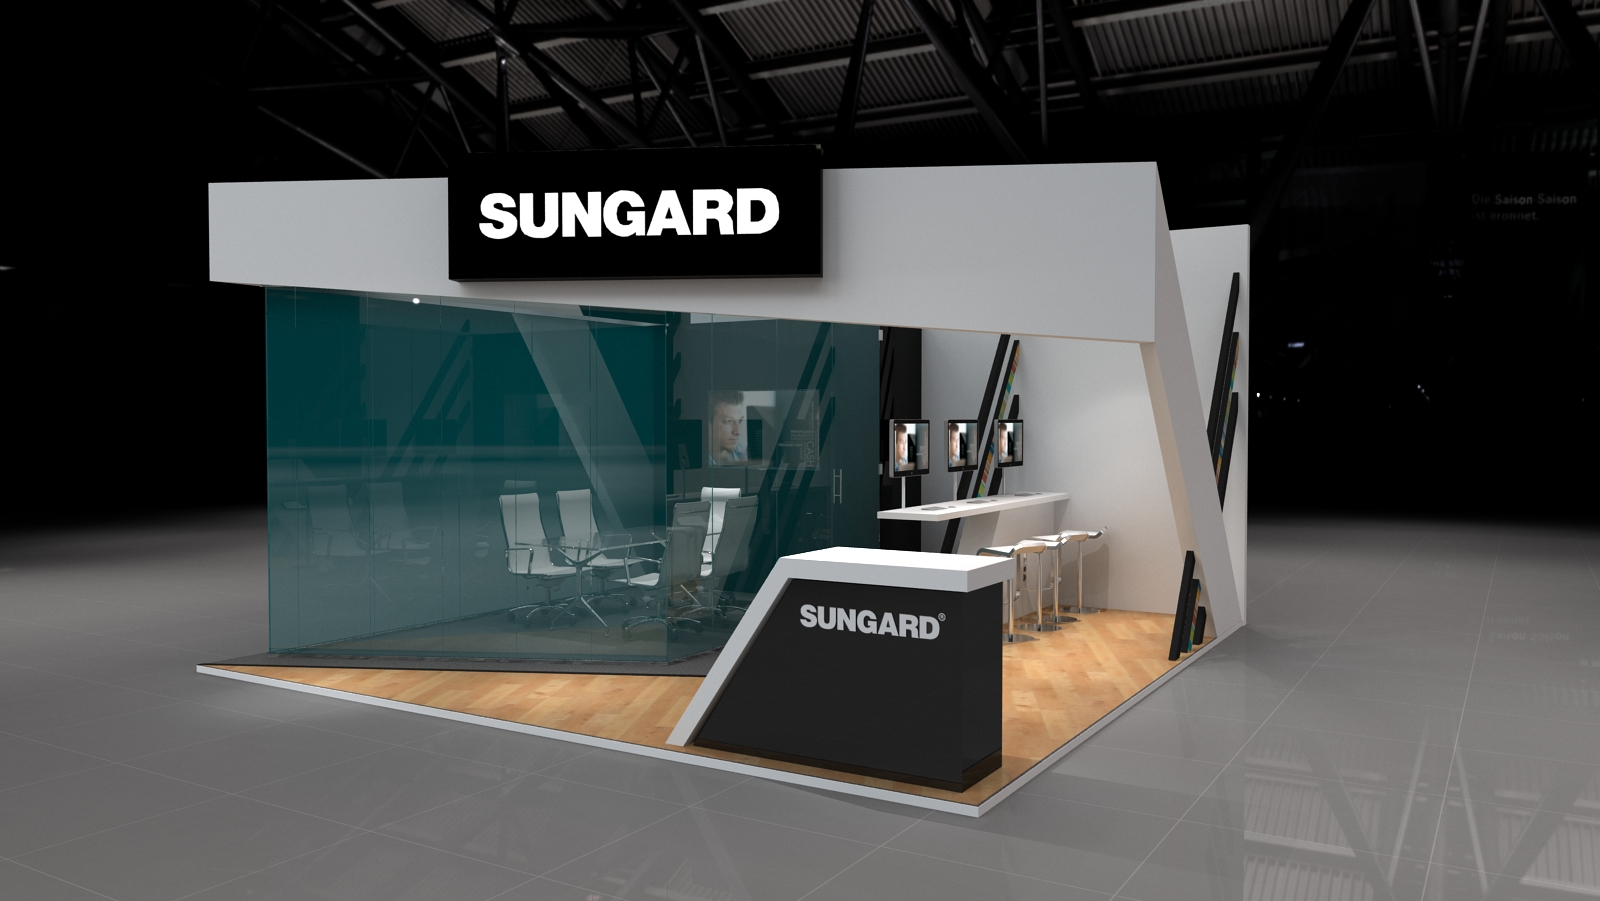 Sungard Exhibition Stand : Rachel poole creative sungard